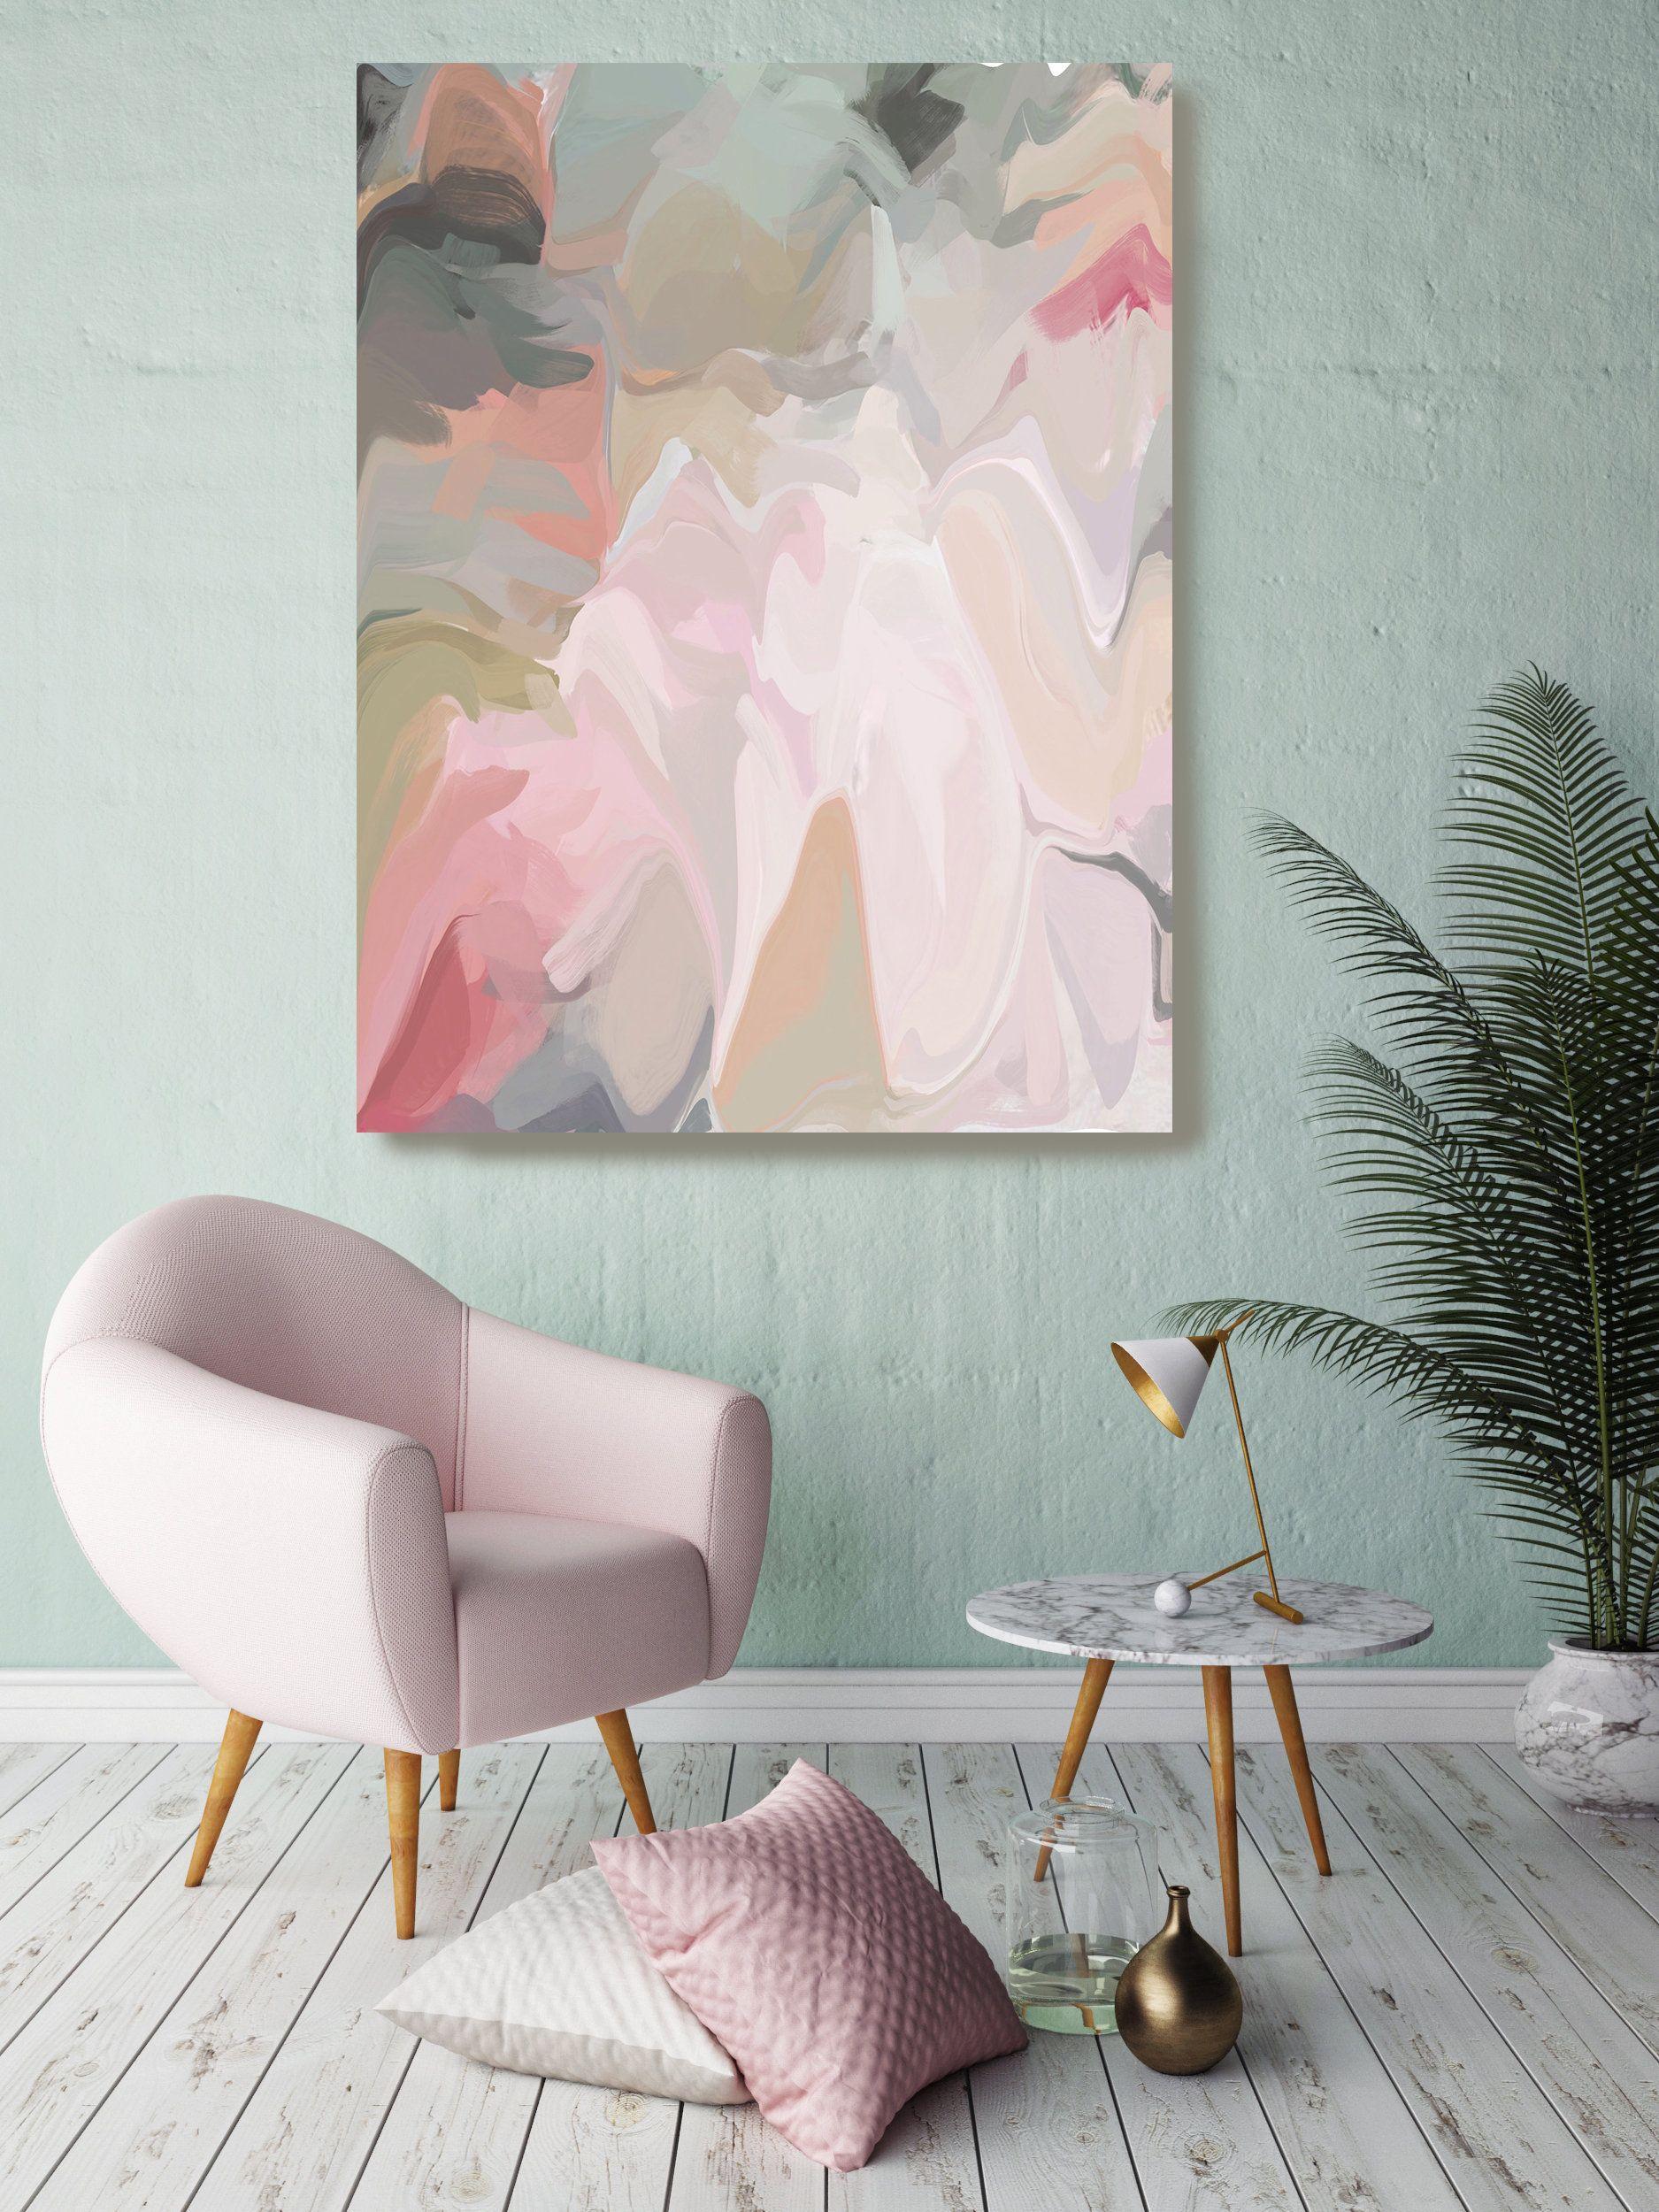 Home Wall Decor Wall Print Printable Modern Abstract Painting Wall Art Pink Green Original Contemporary Art Prints Wall Art Acrylic